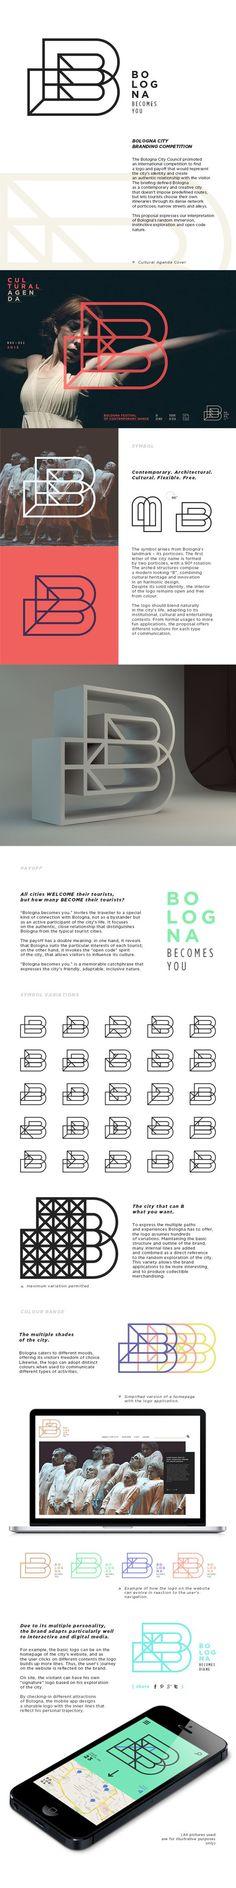 Bologna City Branding . inspiration . logo . outline. geometrical . grid . flexible . adaptable . nice presentation